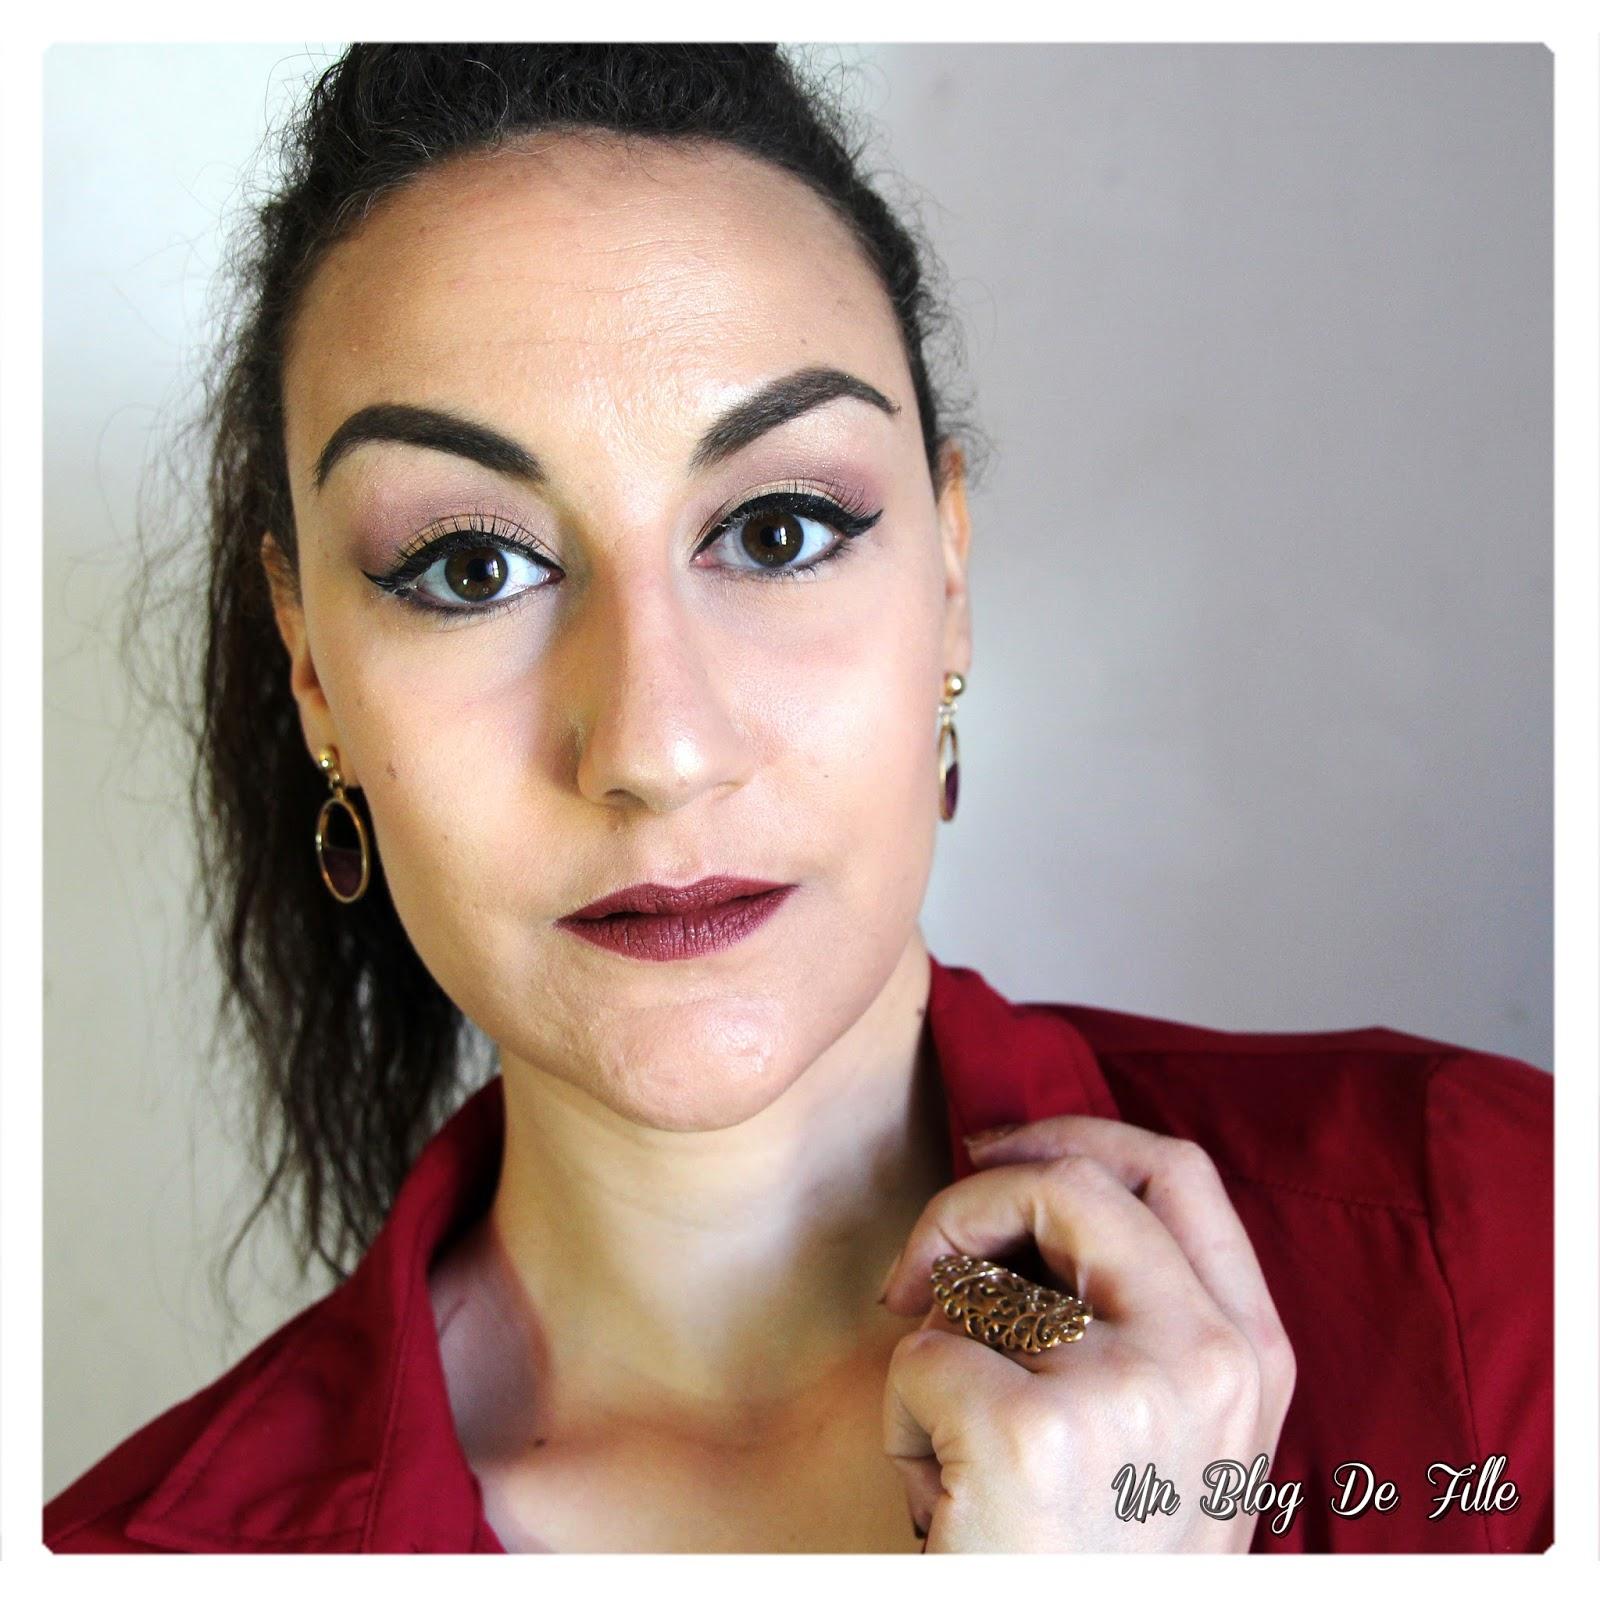 https://unblogdefille.blogspot.fr/2018/04/maquillage-jaune-et-marsala-msc.html